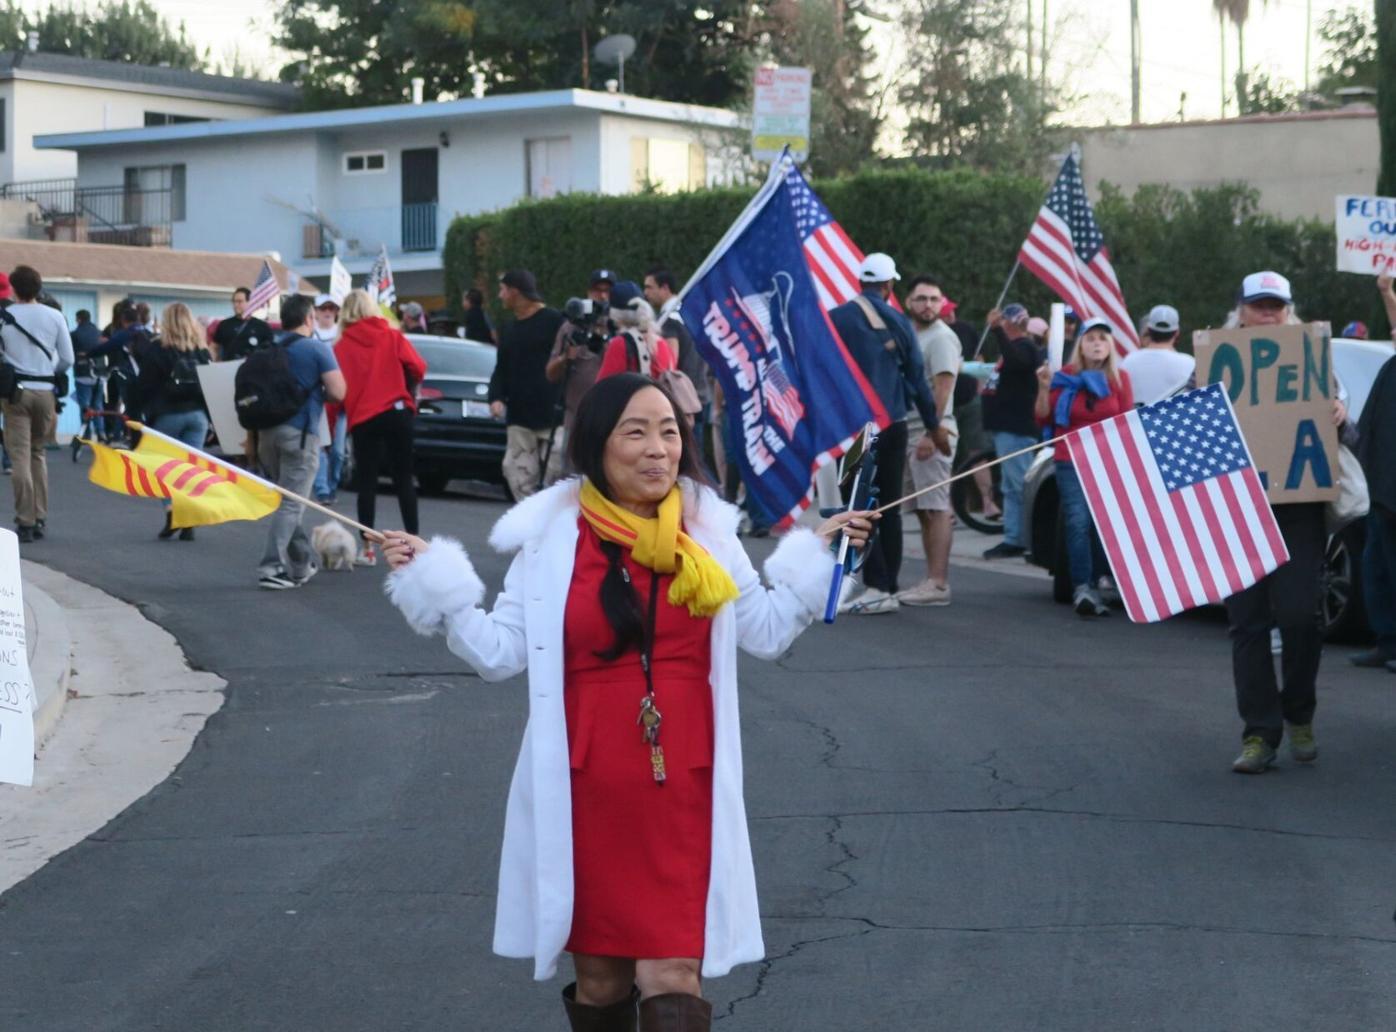 Stay At Home Order Protest Echo Park Jesus Sanchez 11-19-2020 6-16-53 PM.JPG